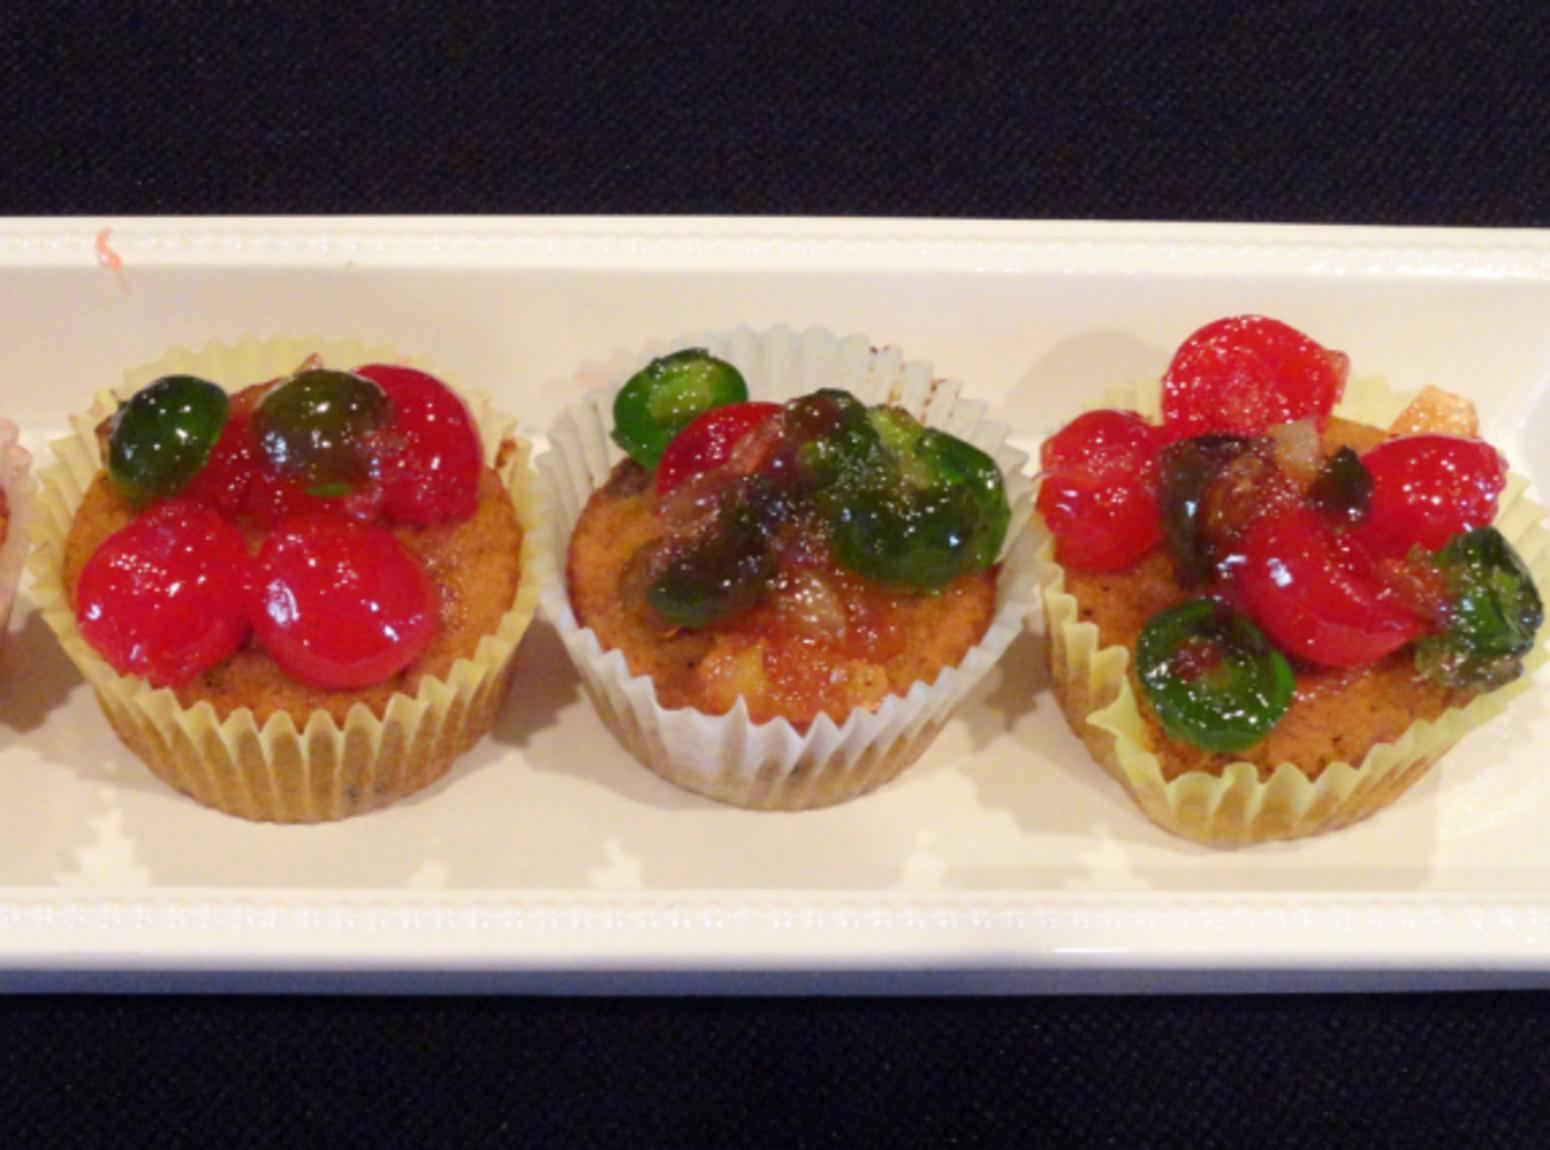 Miniature Fruitcake Cupcakes Recipe